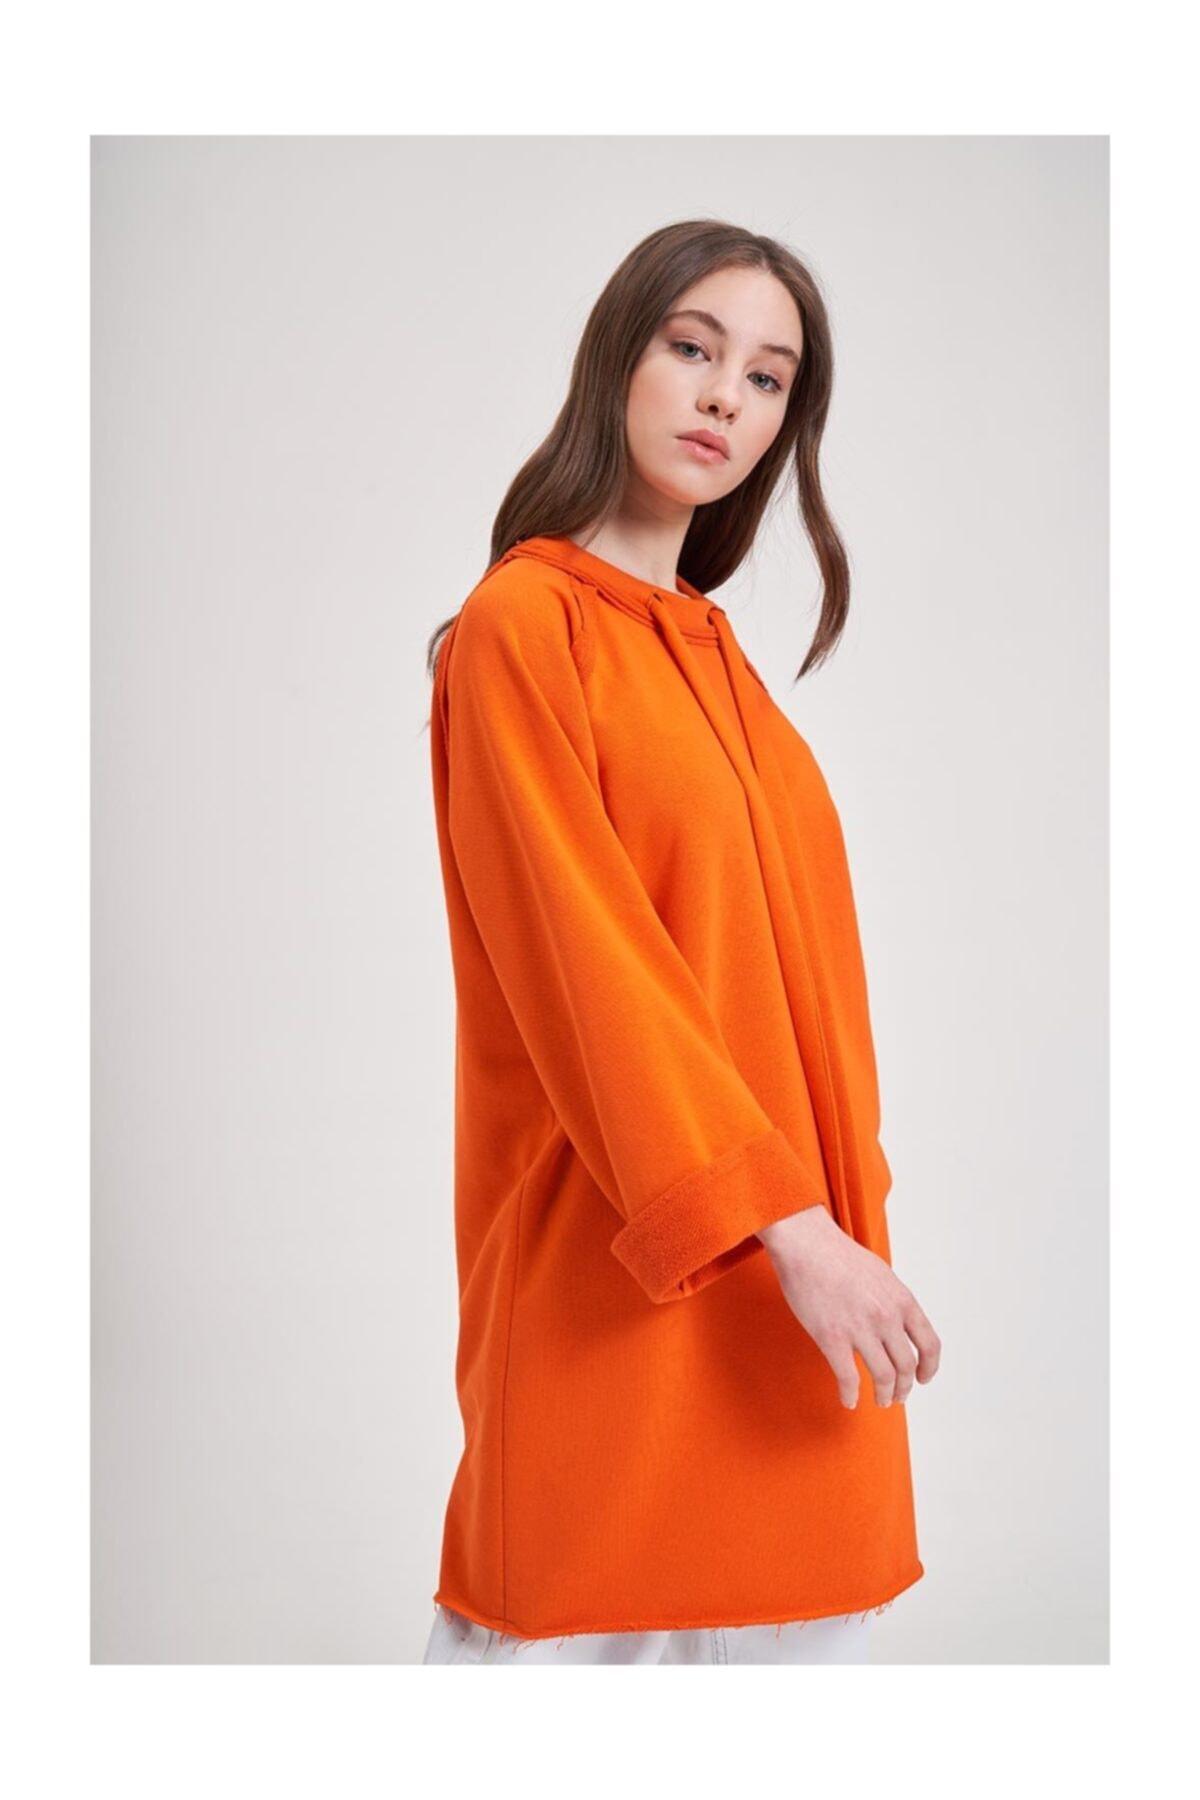 Mizalle Youth Mızalle Youth Yaka Bağcıklı Sweatshirt (turuncu) 1